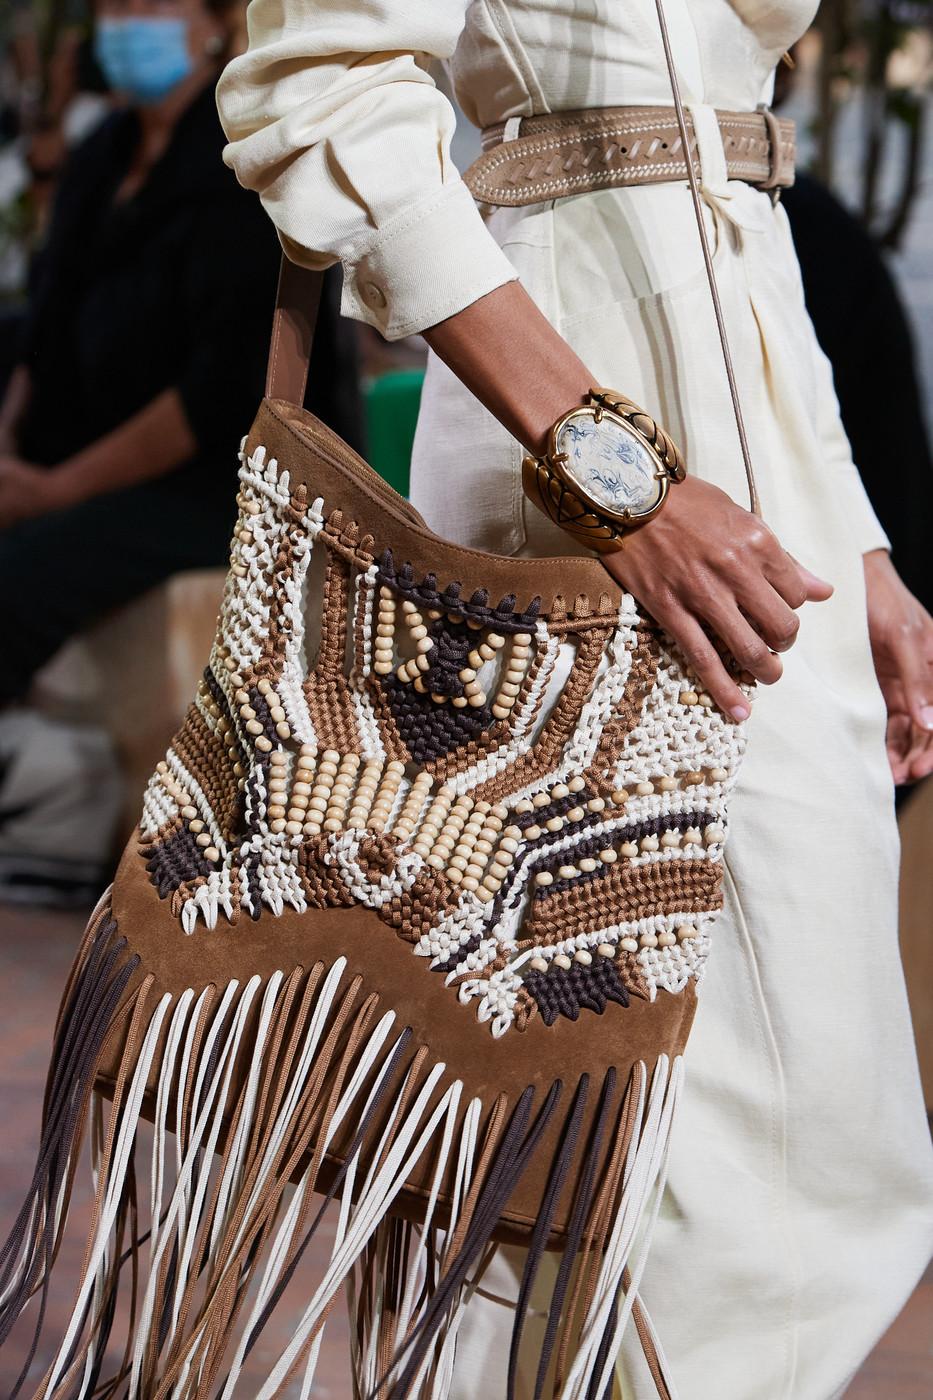 Alberta Ferretti at Milan Fashion Week Spring 2021 | Fashion, Women bags fashion, Fashion week spring